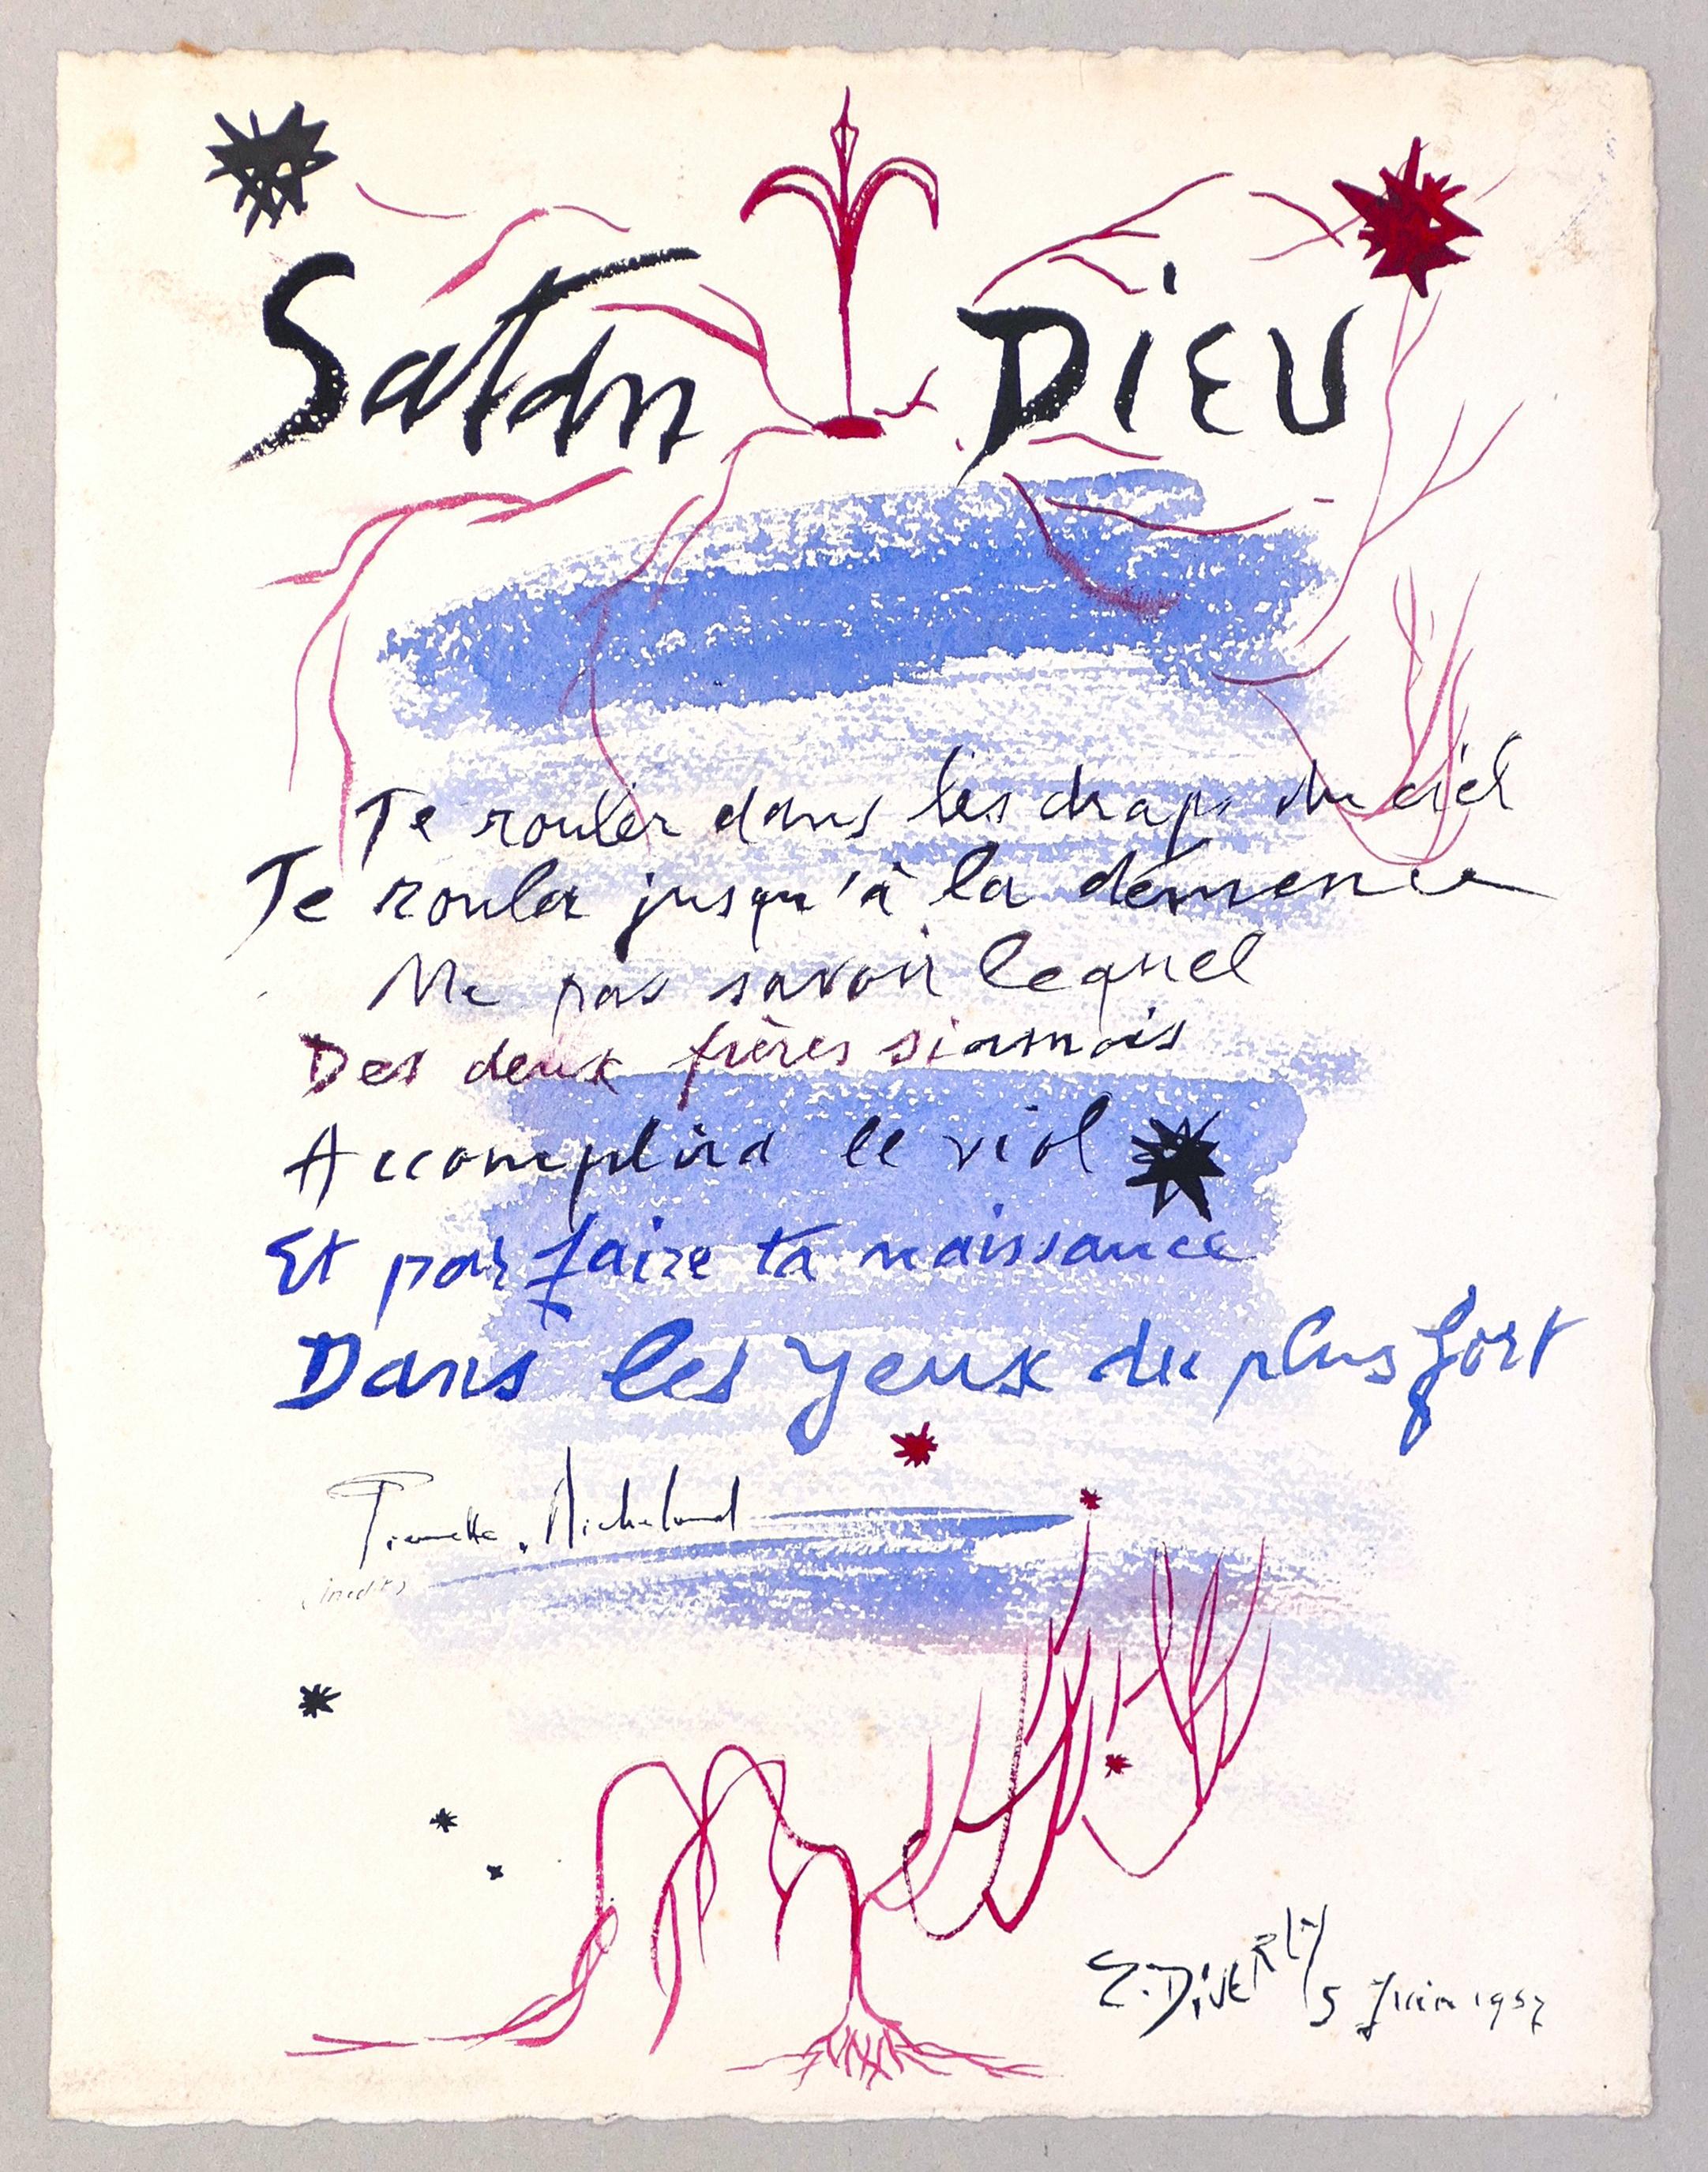 Satan Dieu du 6 Juin 1957 - Original Watercolor on Cardboard - 1957